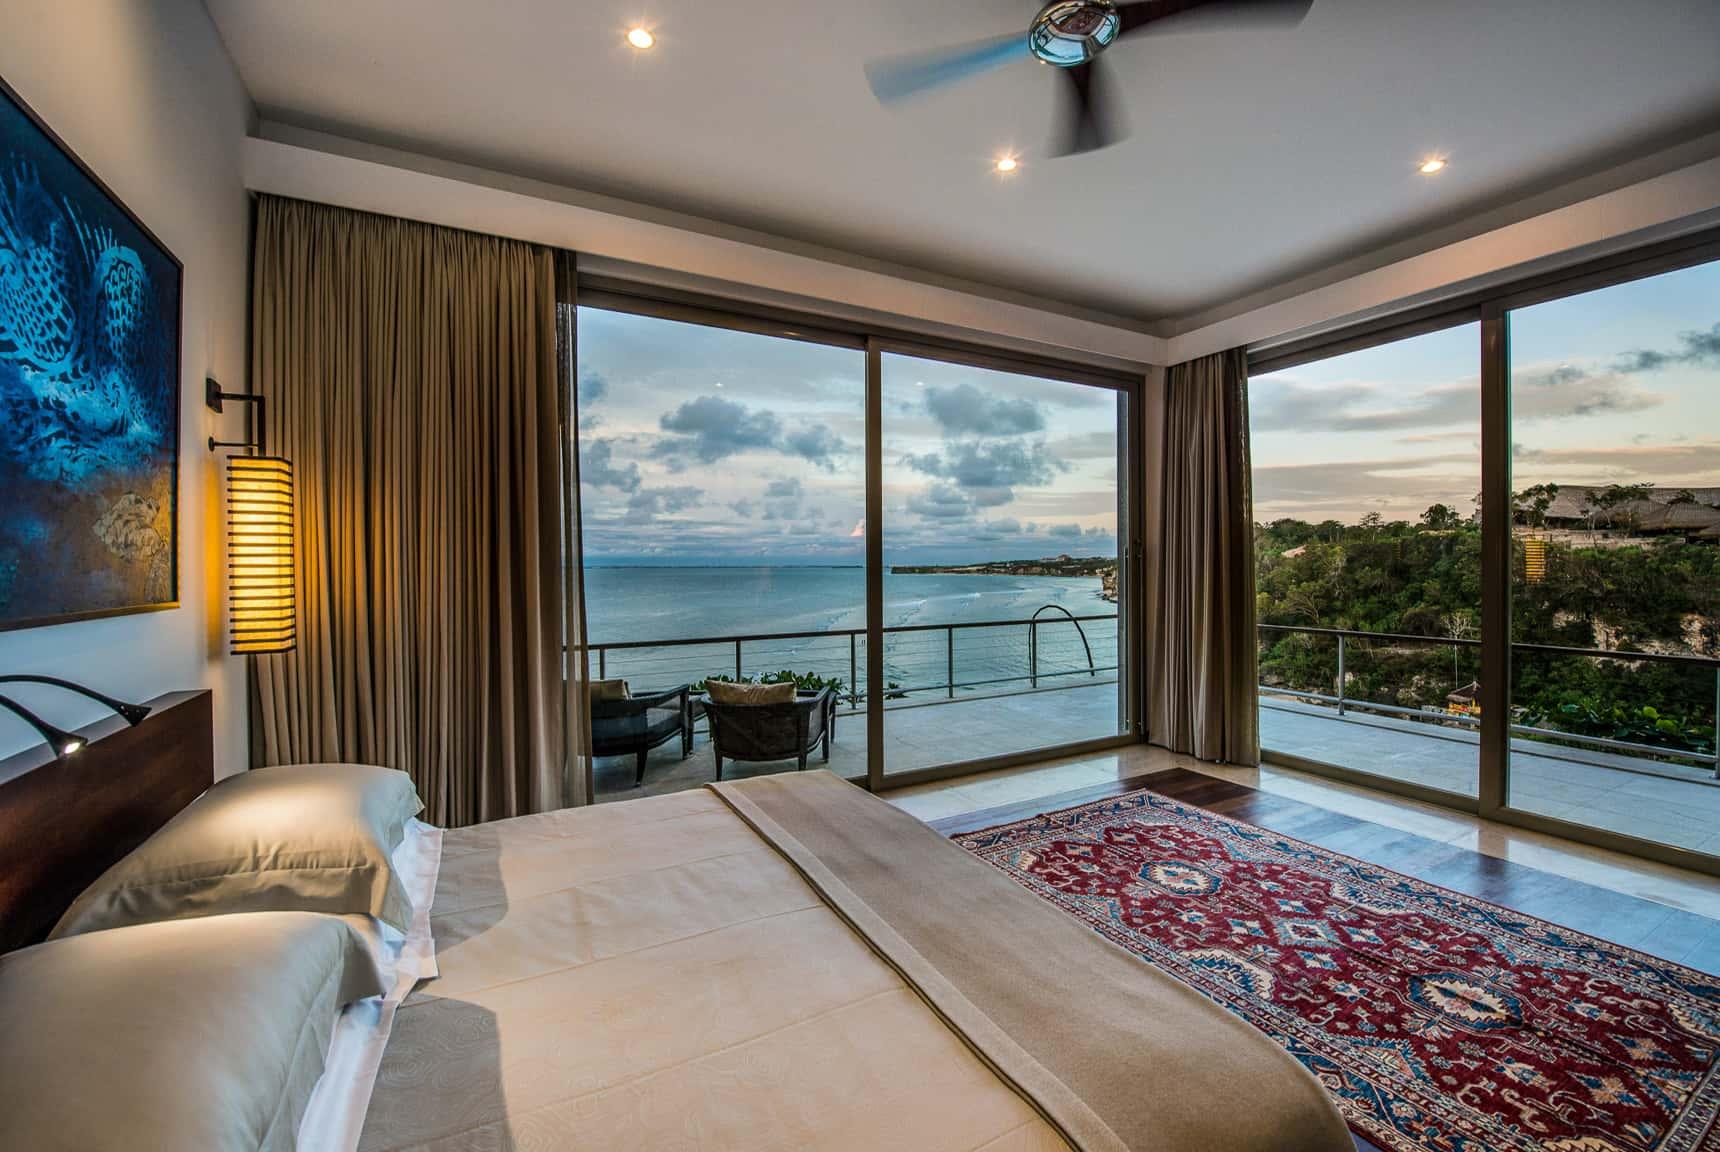 Editing luxury hotel resort villa photography for Design hotel bali